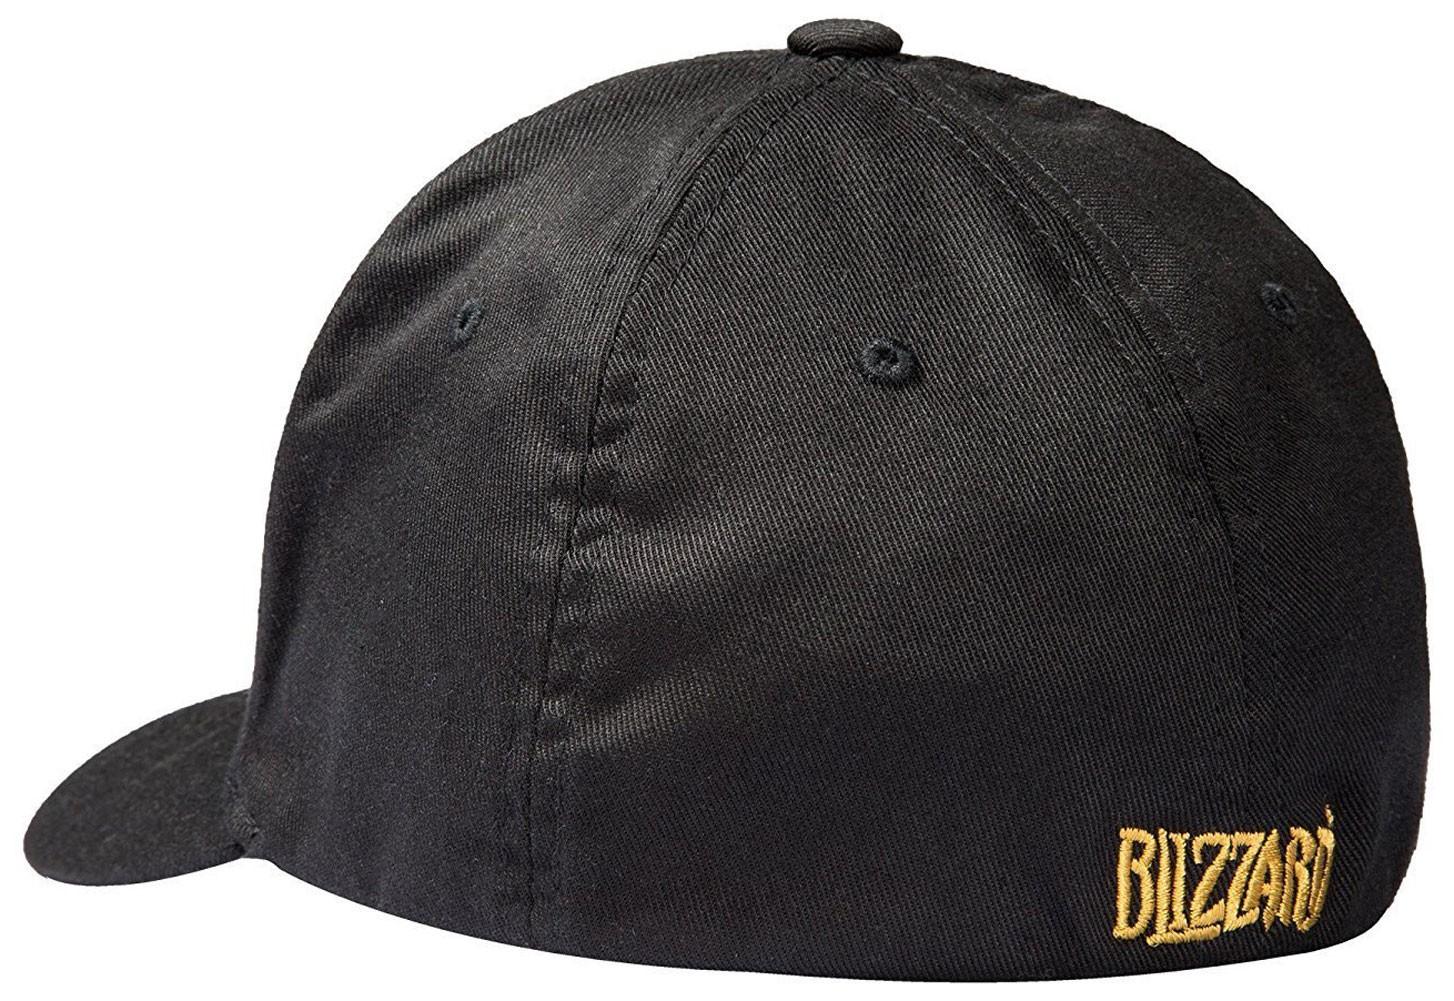 World of Warcraft Monk Paw Logo kepurėlė L/XL